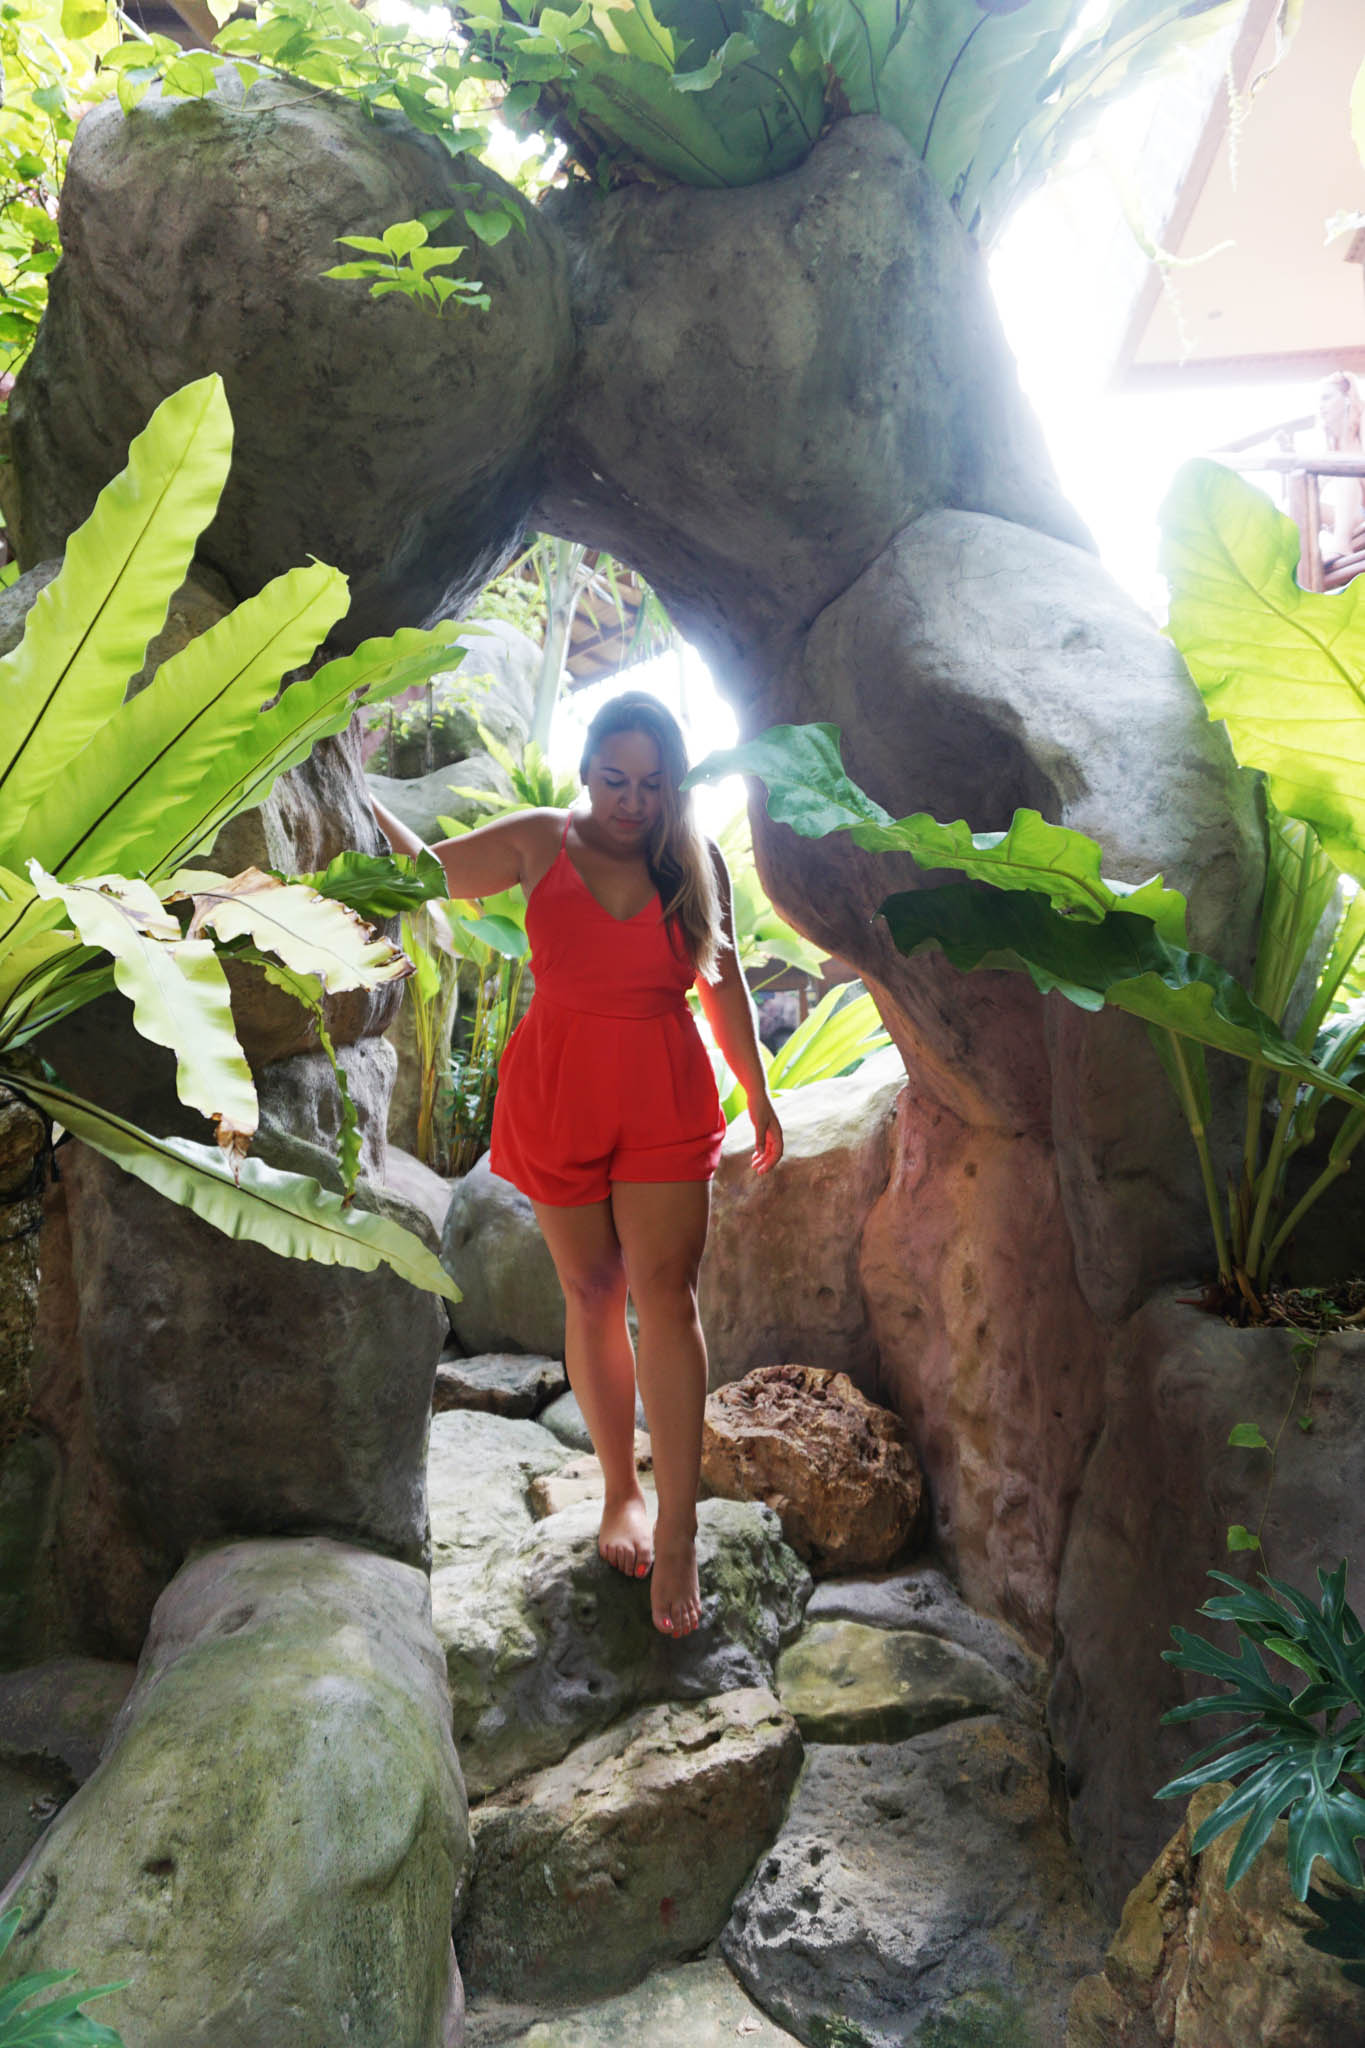 Exploring the unique, beautiful pool area at Udara Bali